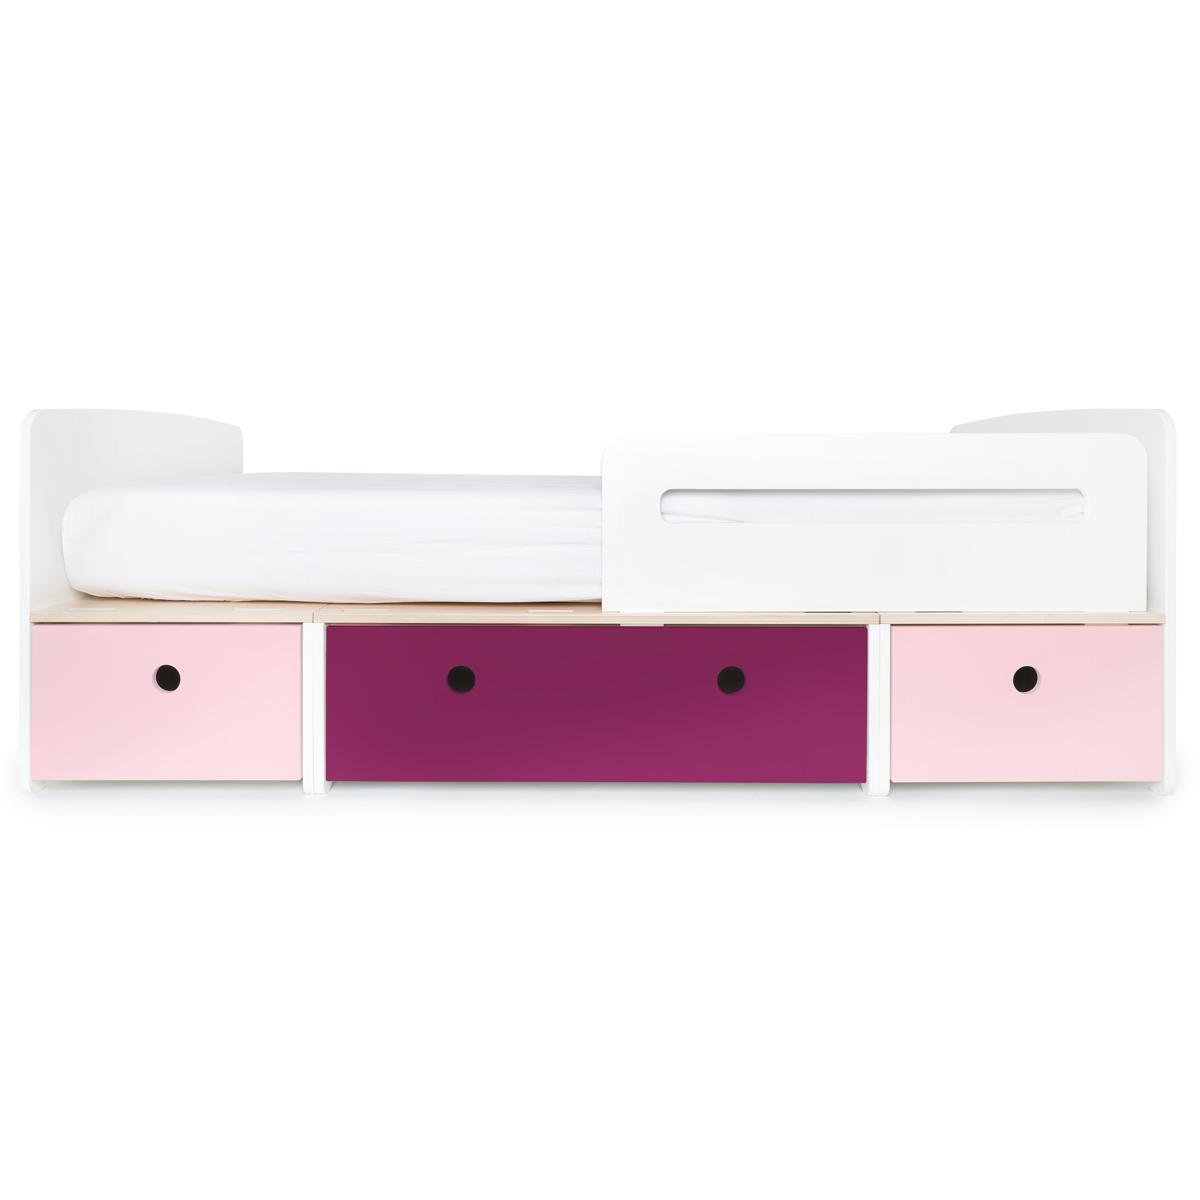 Kinderbett 90x200cm COLORFLEX Abitare Kids sweet pink-plum-sweet pink